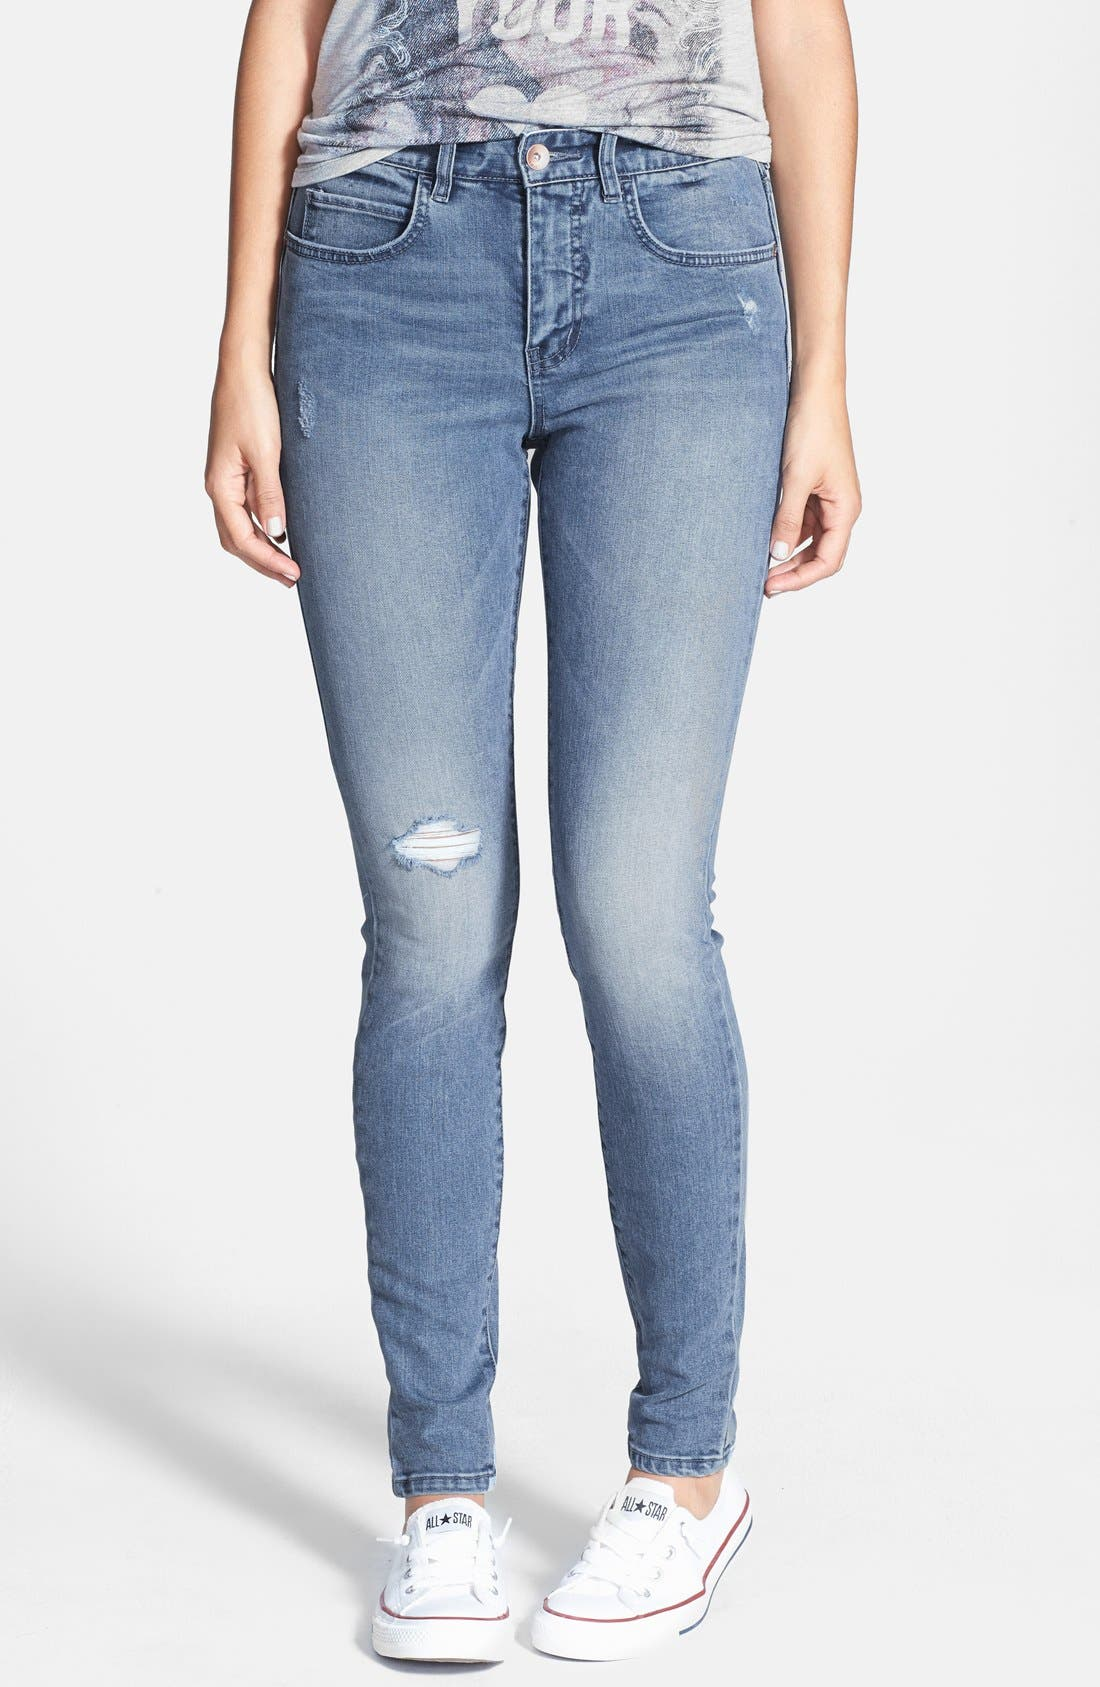 Alternate Image 1 Selected - Billabong 'Night Hawks' Skinny Jeans (Light Wash) (Juniors)